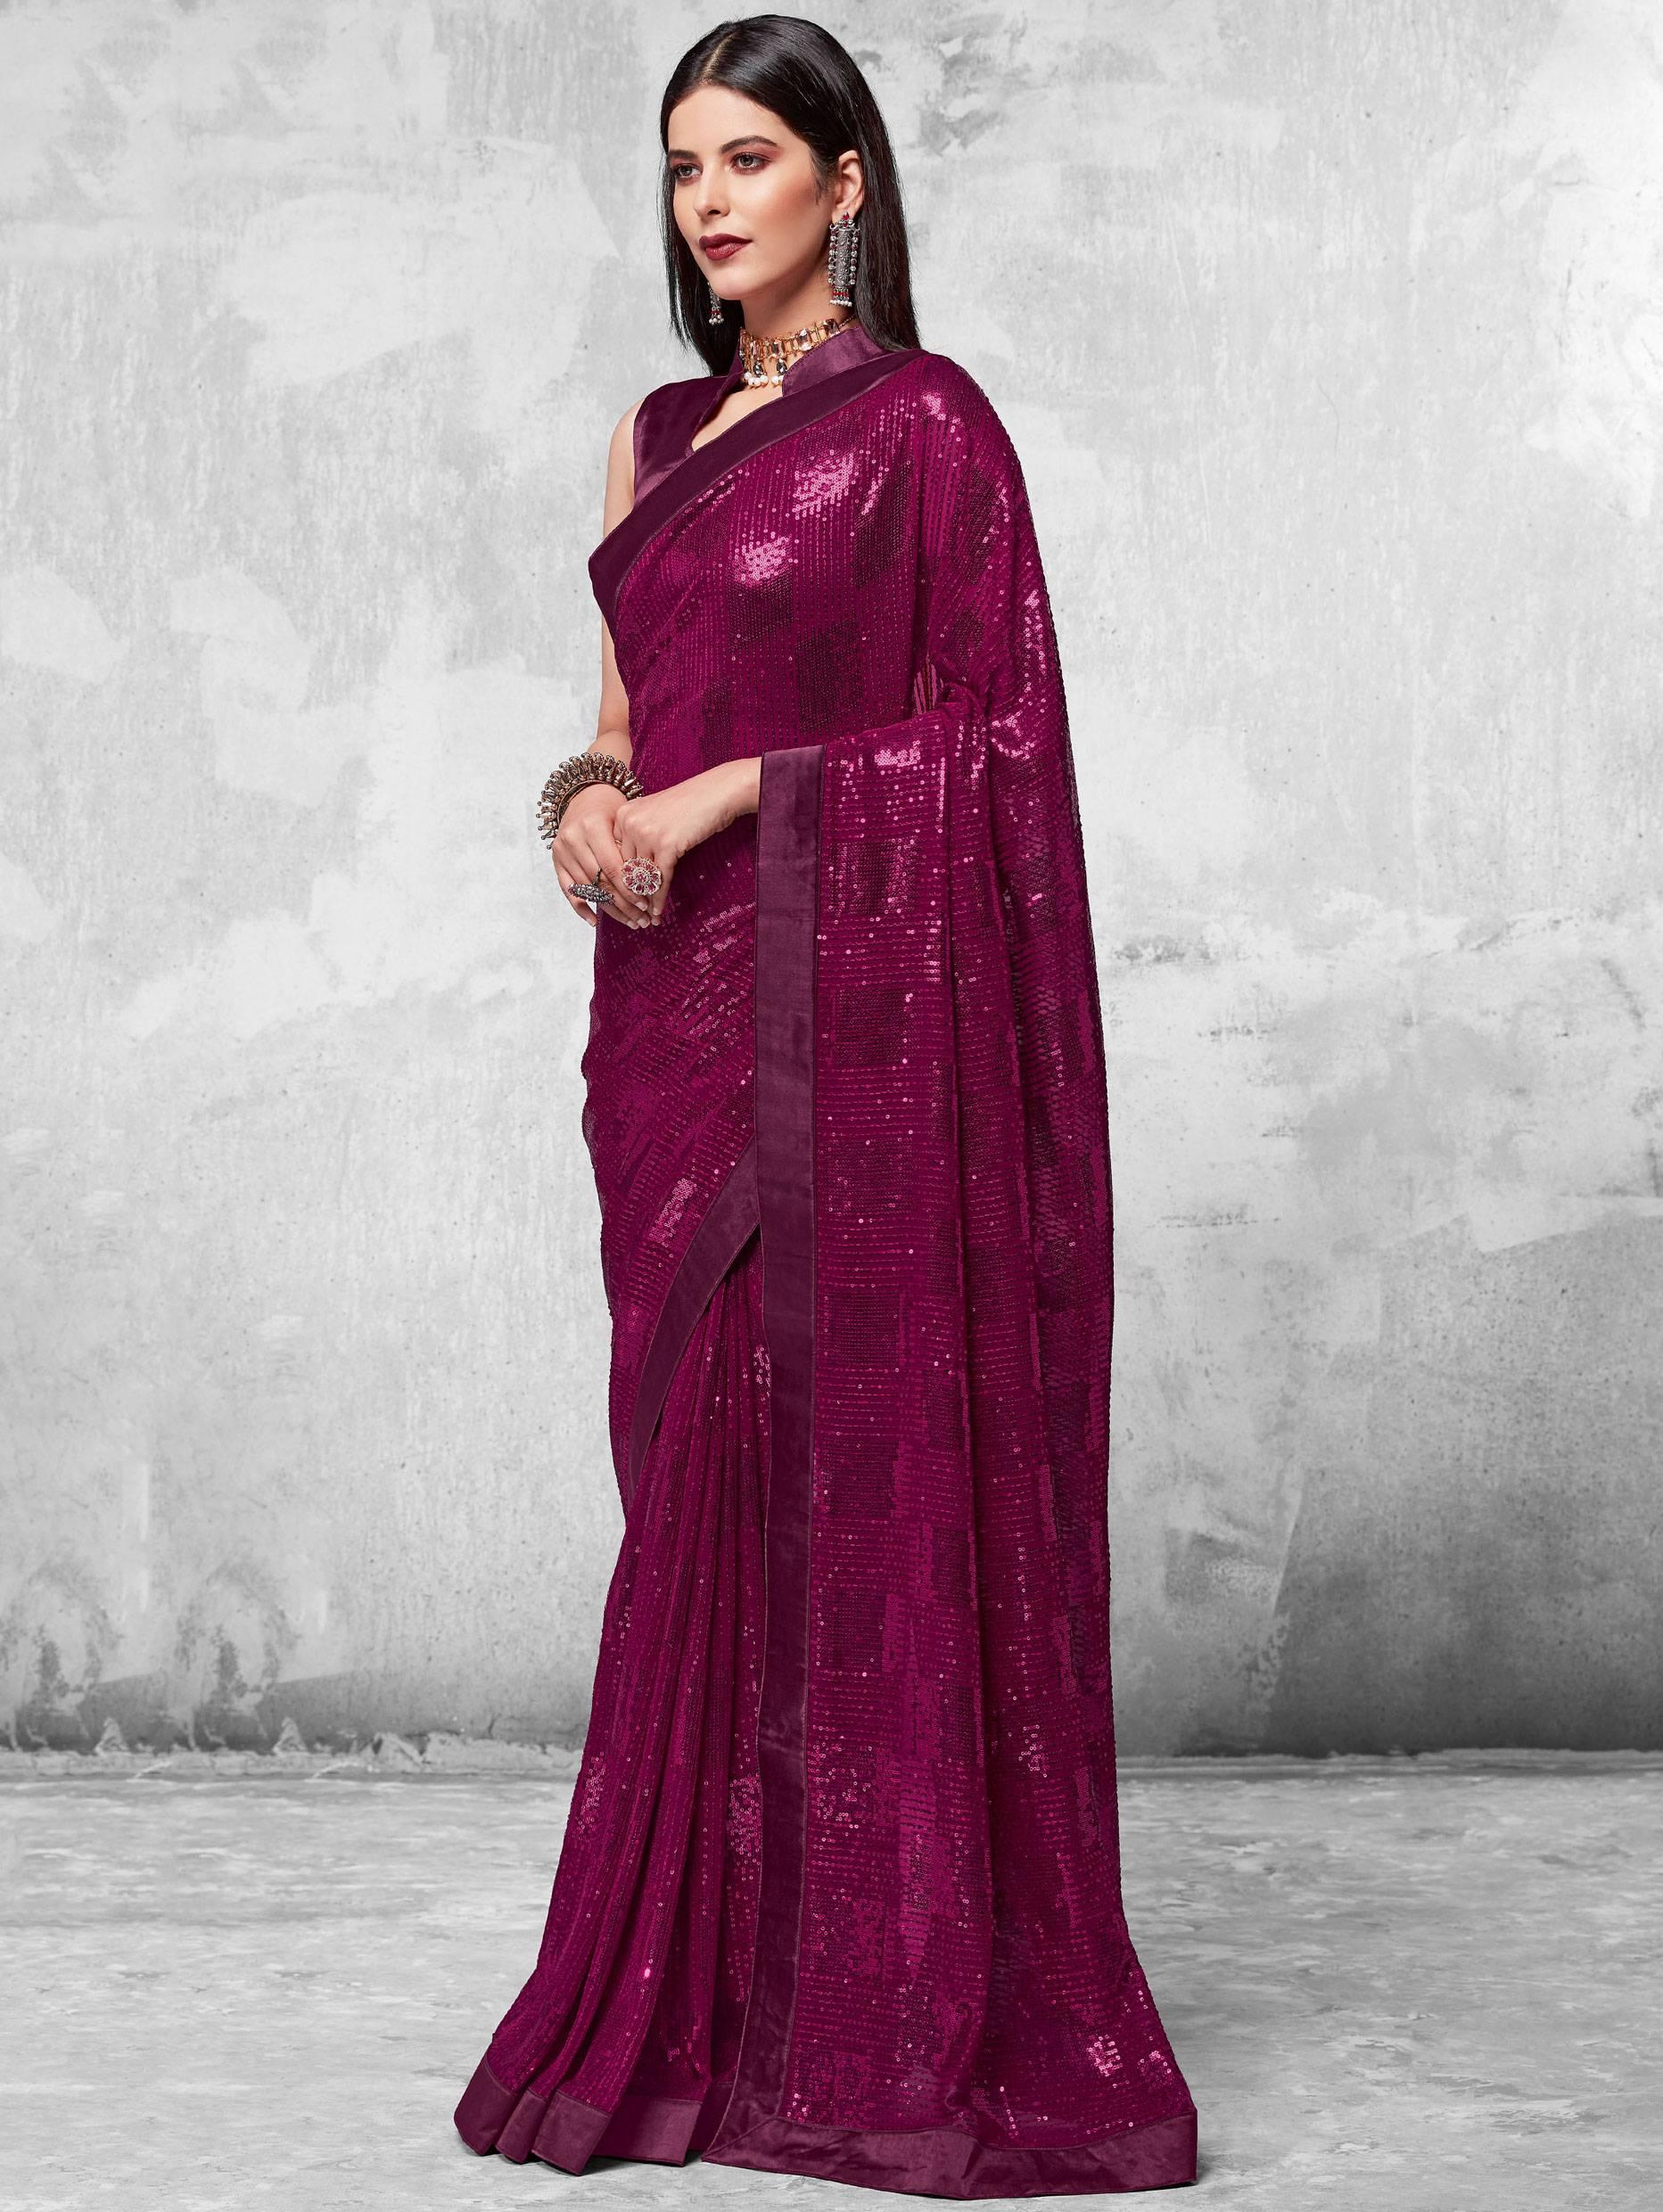 Best Sequins Worked Purple Color Partywear Saree In Summer.